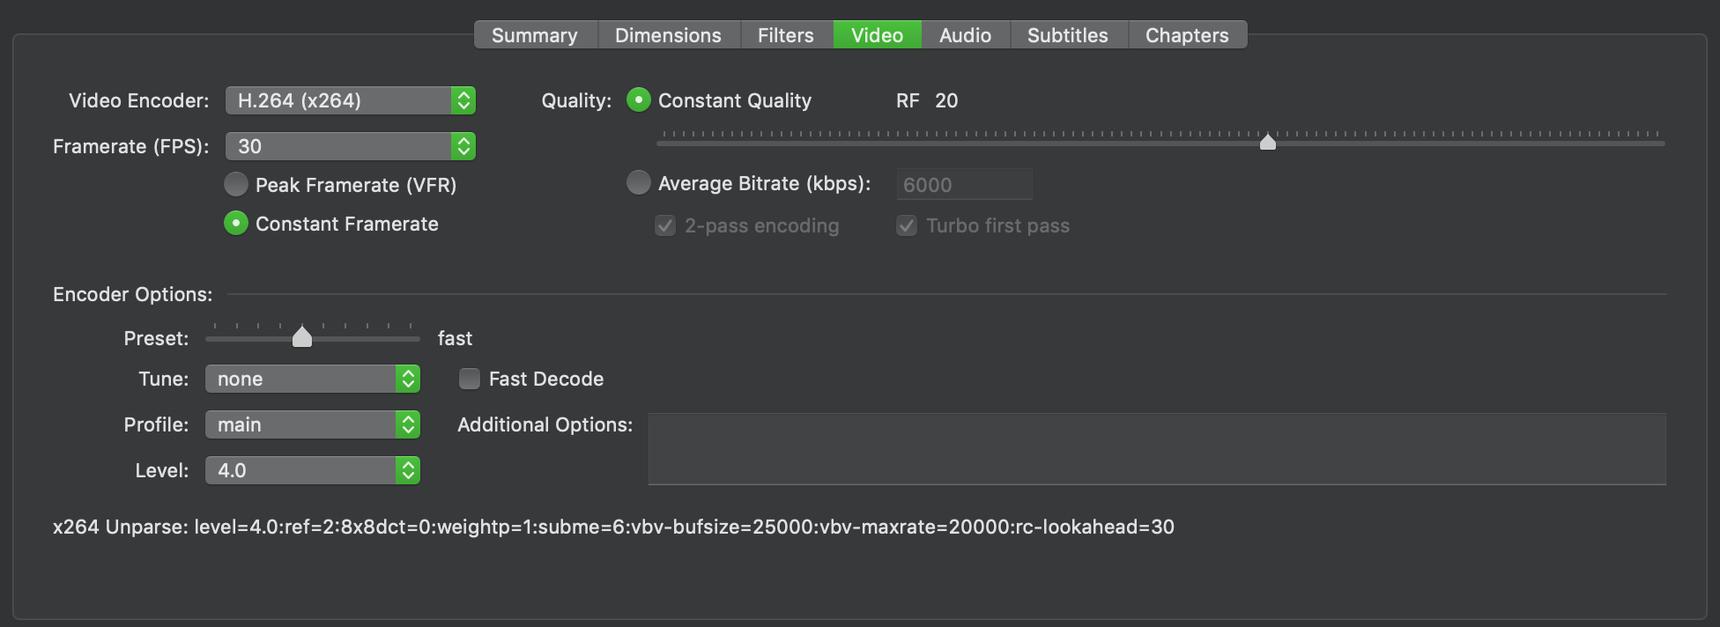 Set ScreenFlow export settings to match Handbrake